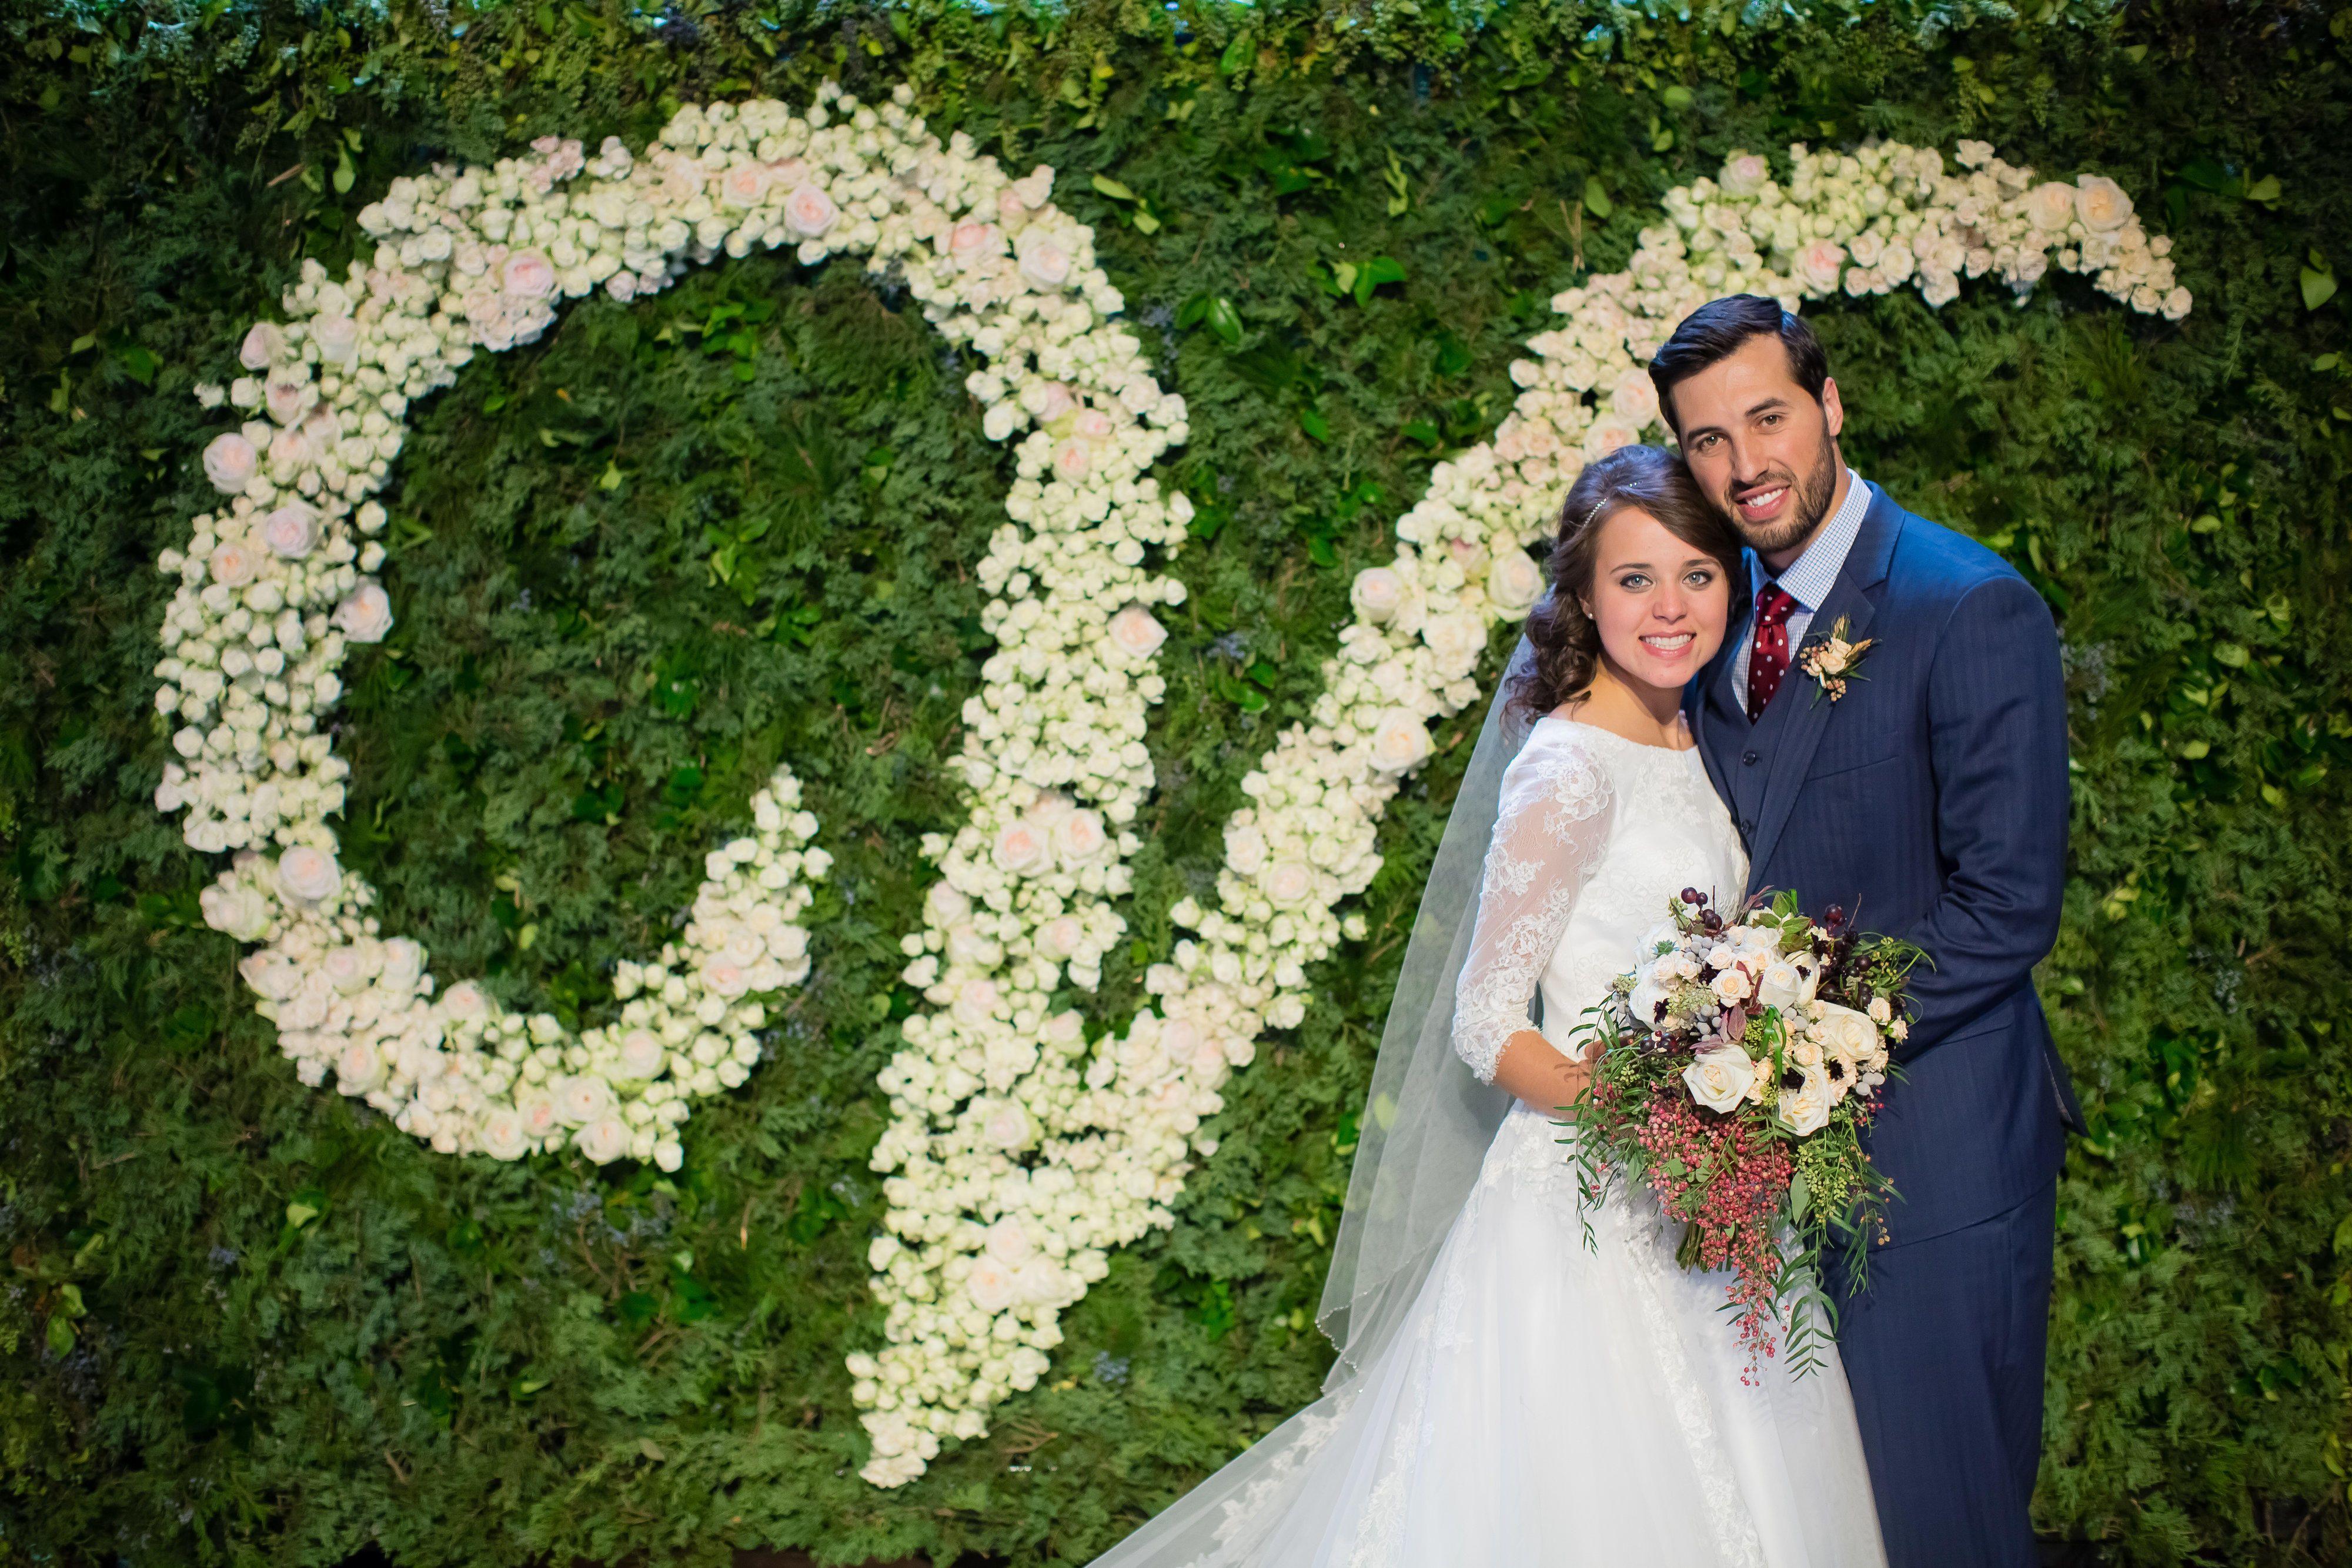 Tlc Official Site Duggar Wedding Jinger Duggar Wedding Flower Wall Wedding